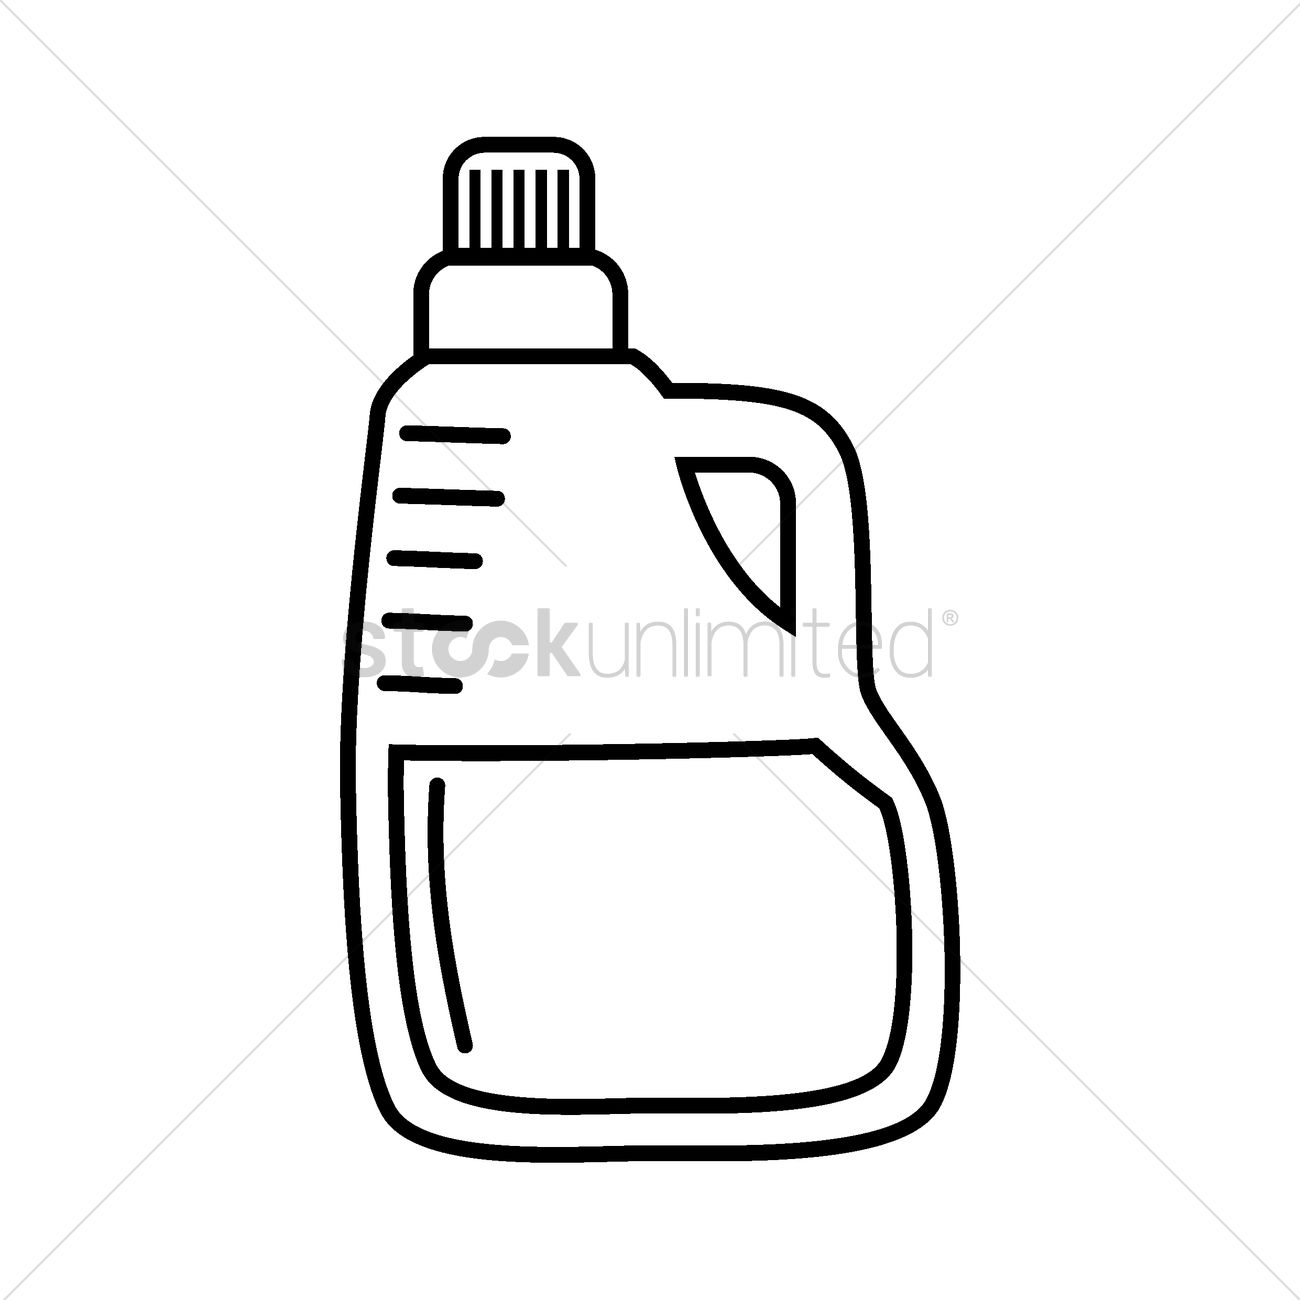 Detergent Bottle Vector Image